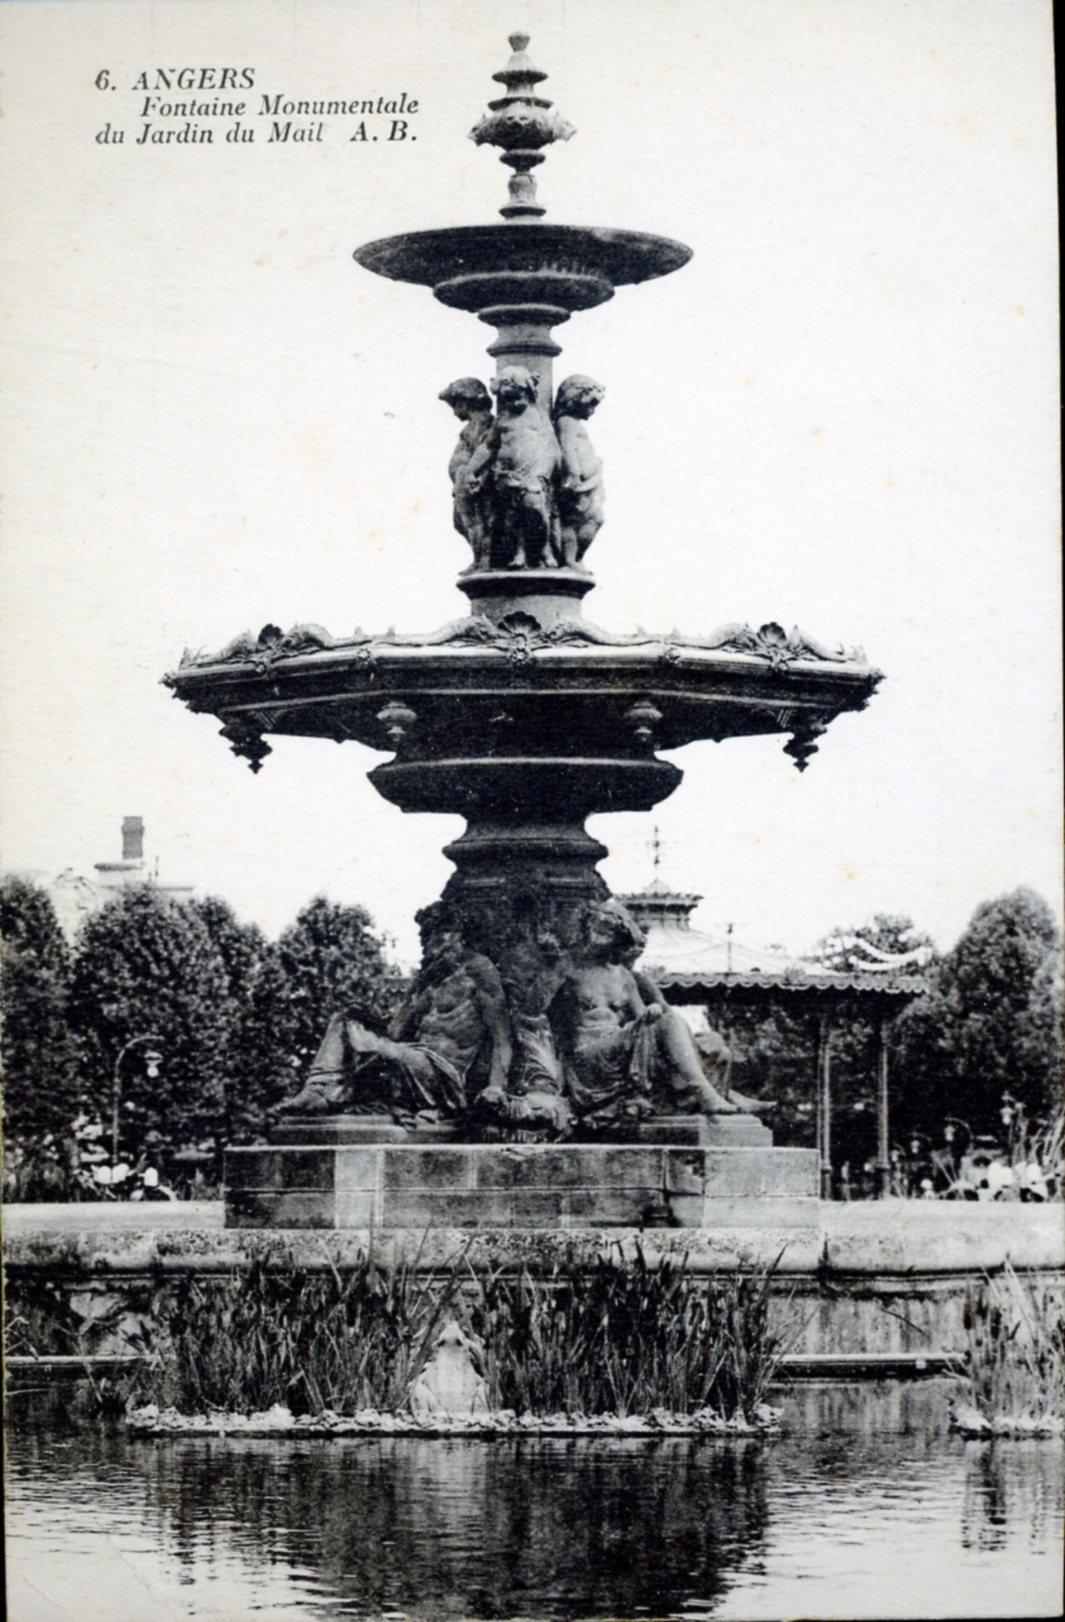 photo angers 49000 fontaine monumentale du jardin du mail vers 1928 carte postale. Black Bedroom Furniture Sets. Home Design Ideas